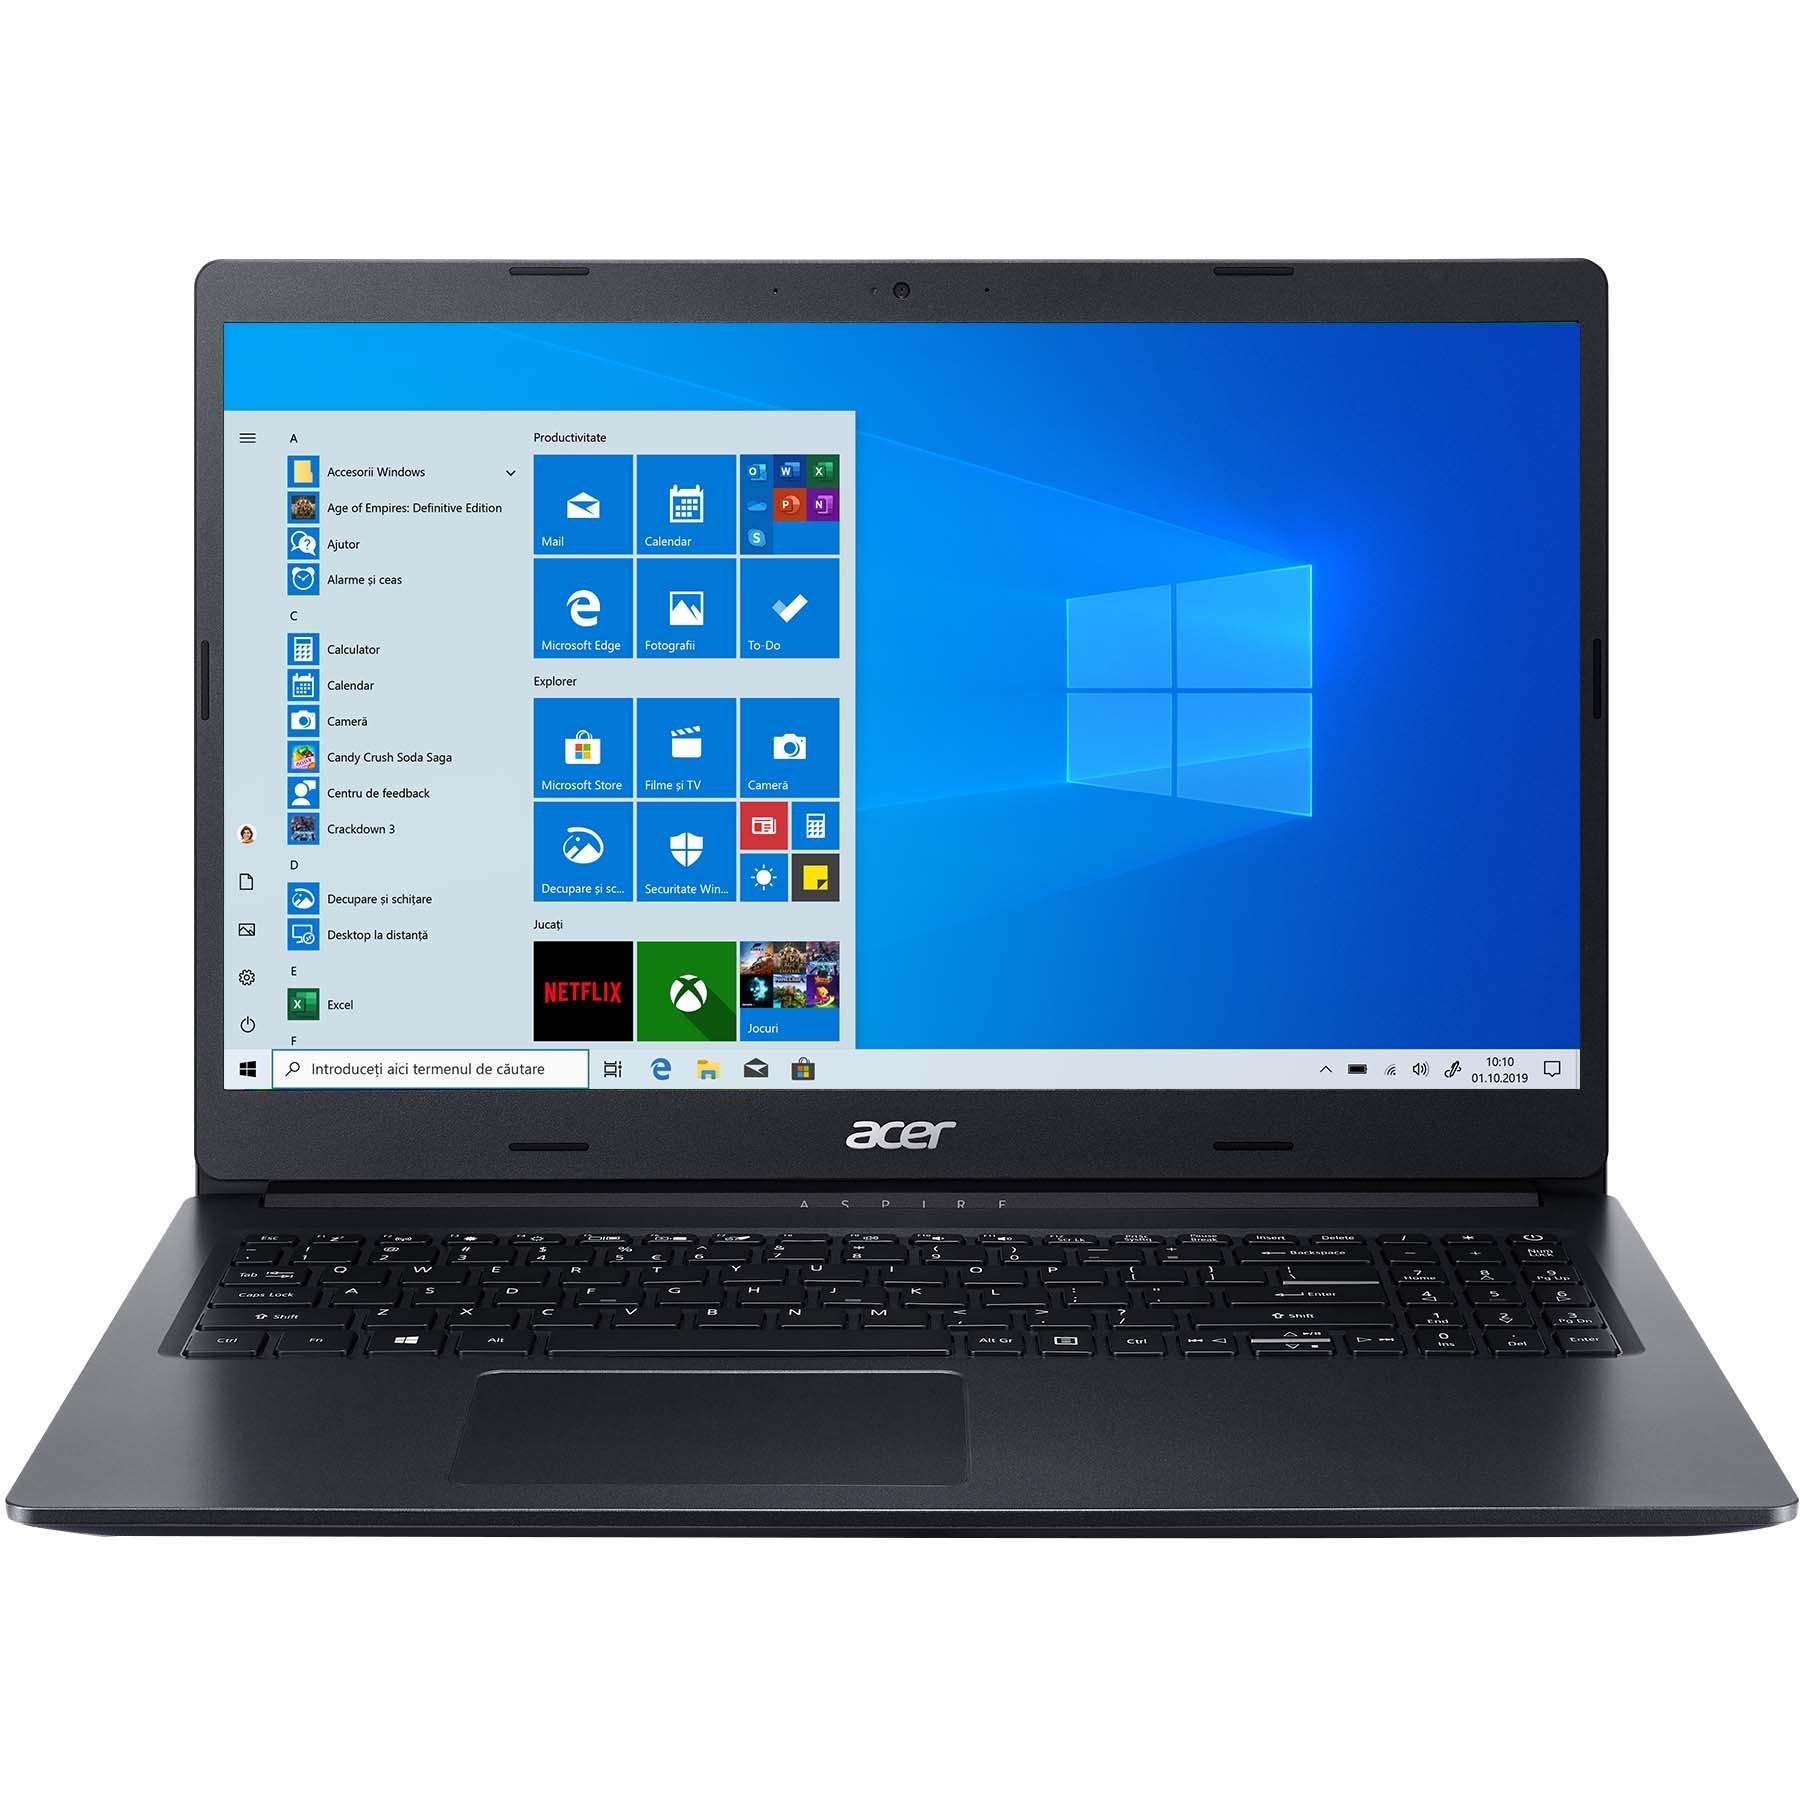 "Fotografie Laptop Acer Aspire 3 A315-23G cu procesor AMD Ryzen 5 3500U, 15.6"", Full HD, 8GB, 256GB SSD, AMD Radeon Graphics, Windows 10 Home, Black"